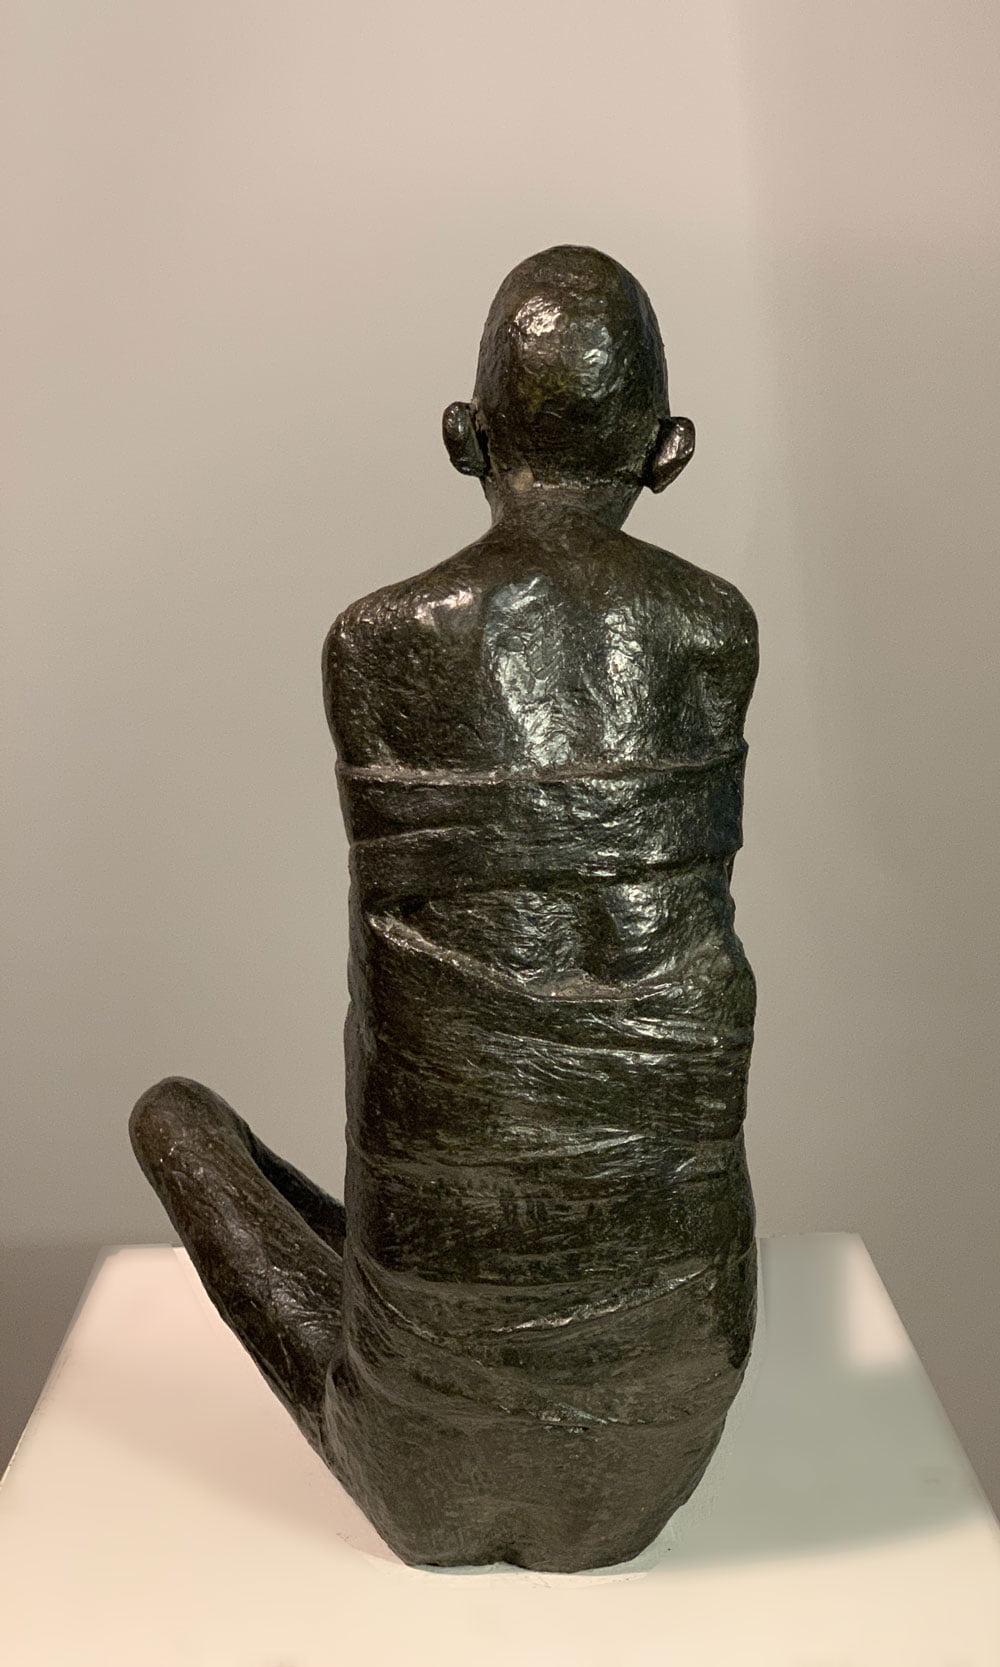 Captive-VII-de-Marc-Petit-Galerie-21